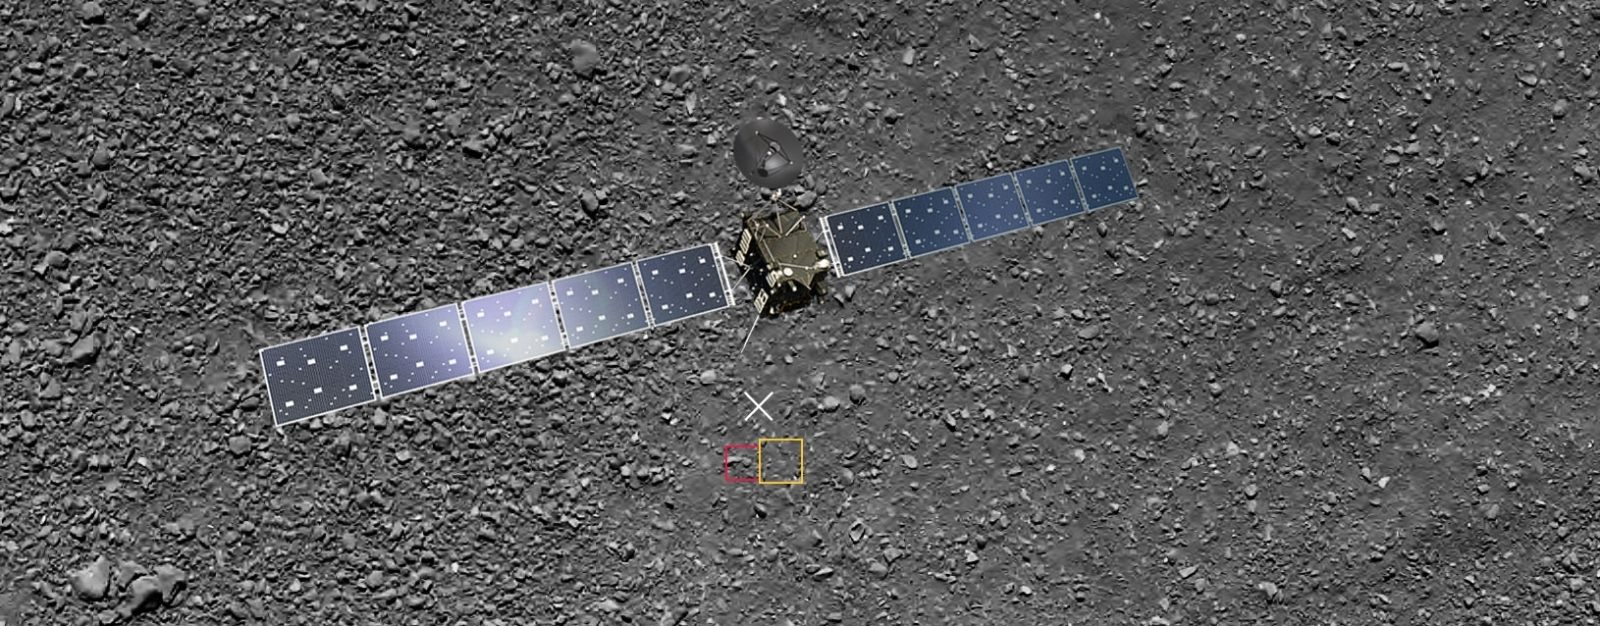 Rosetta landing site